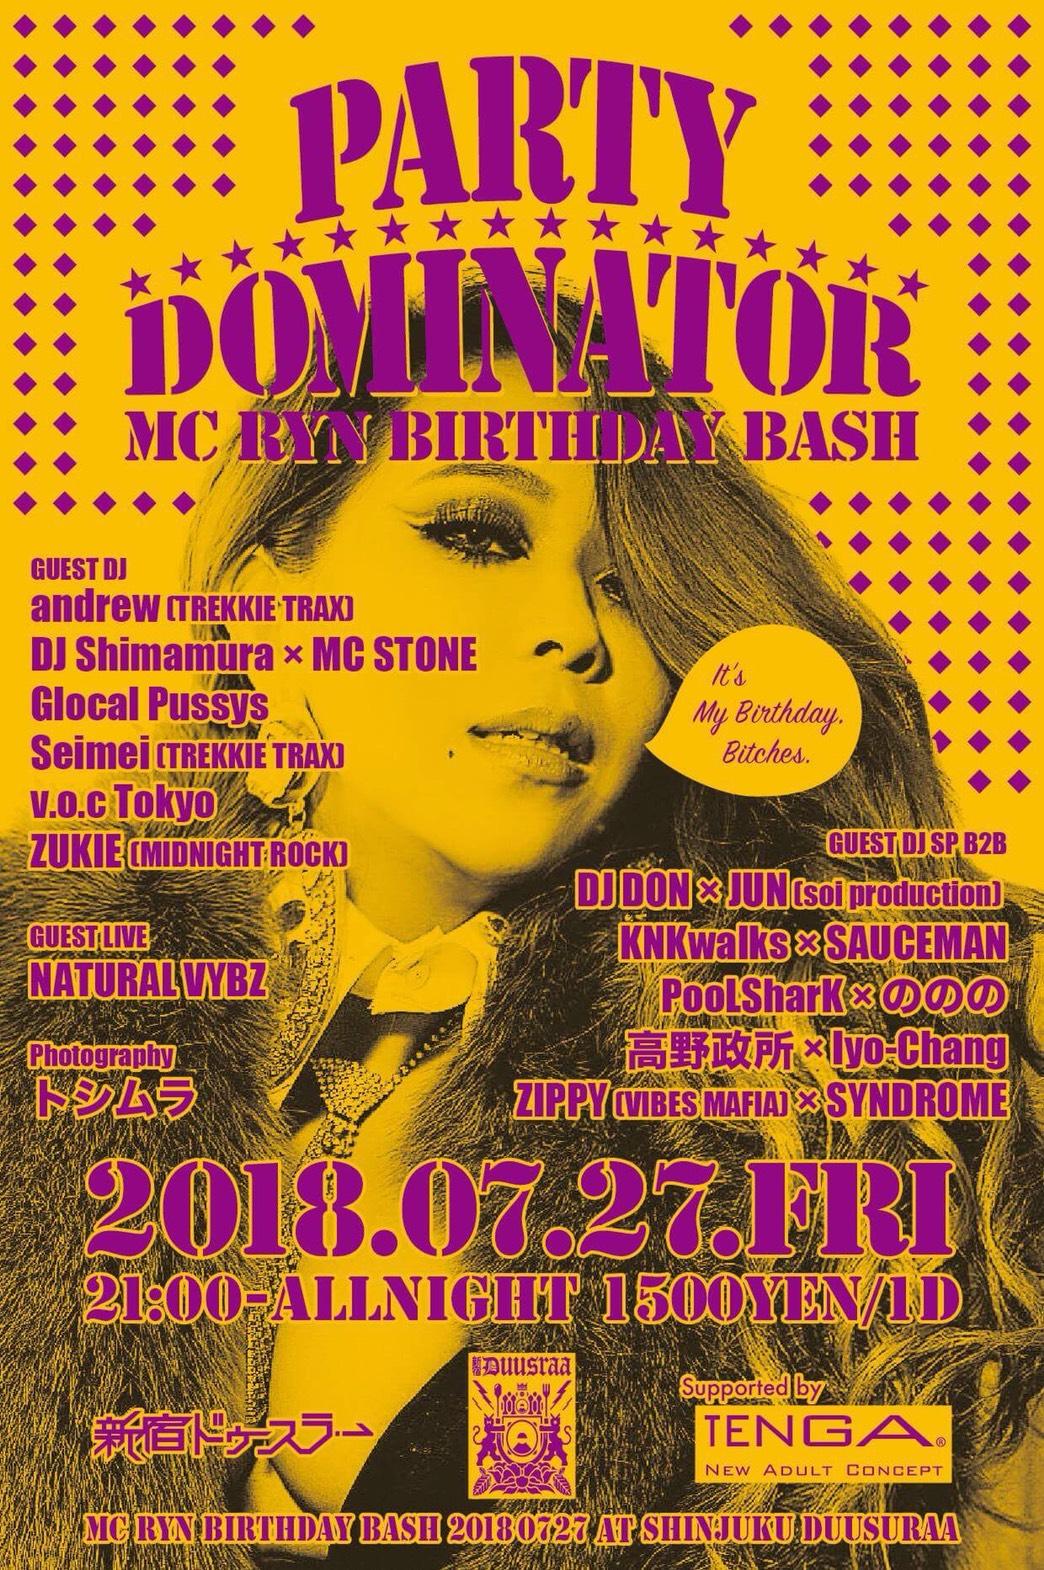 PARTY DOMINATOR -MC RyN BIRTHDAY BASH-